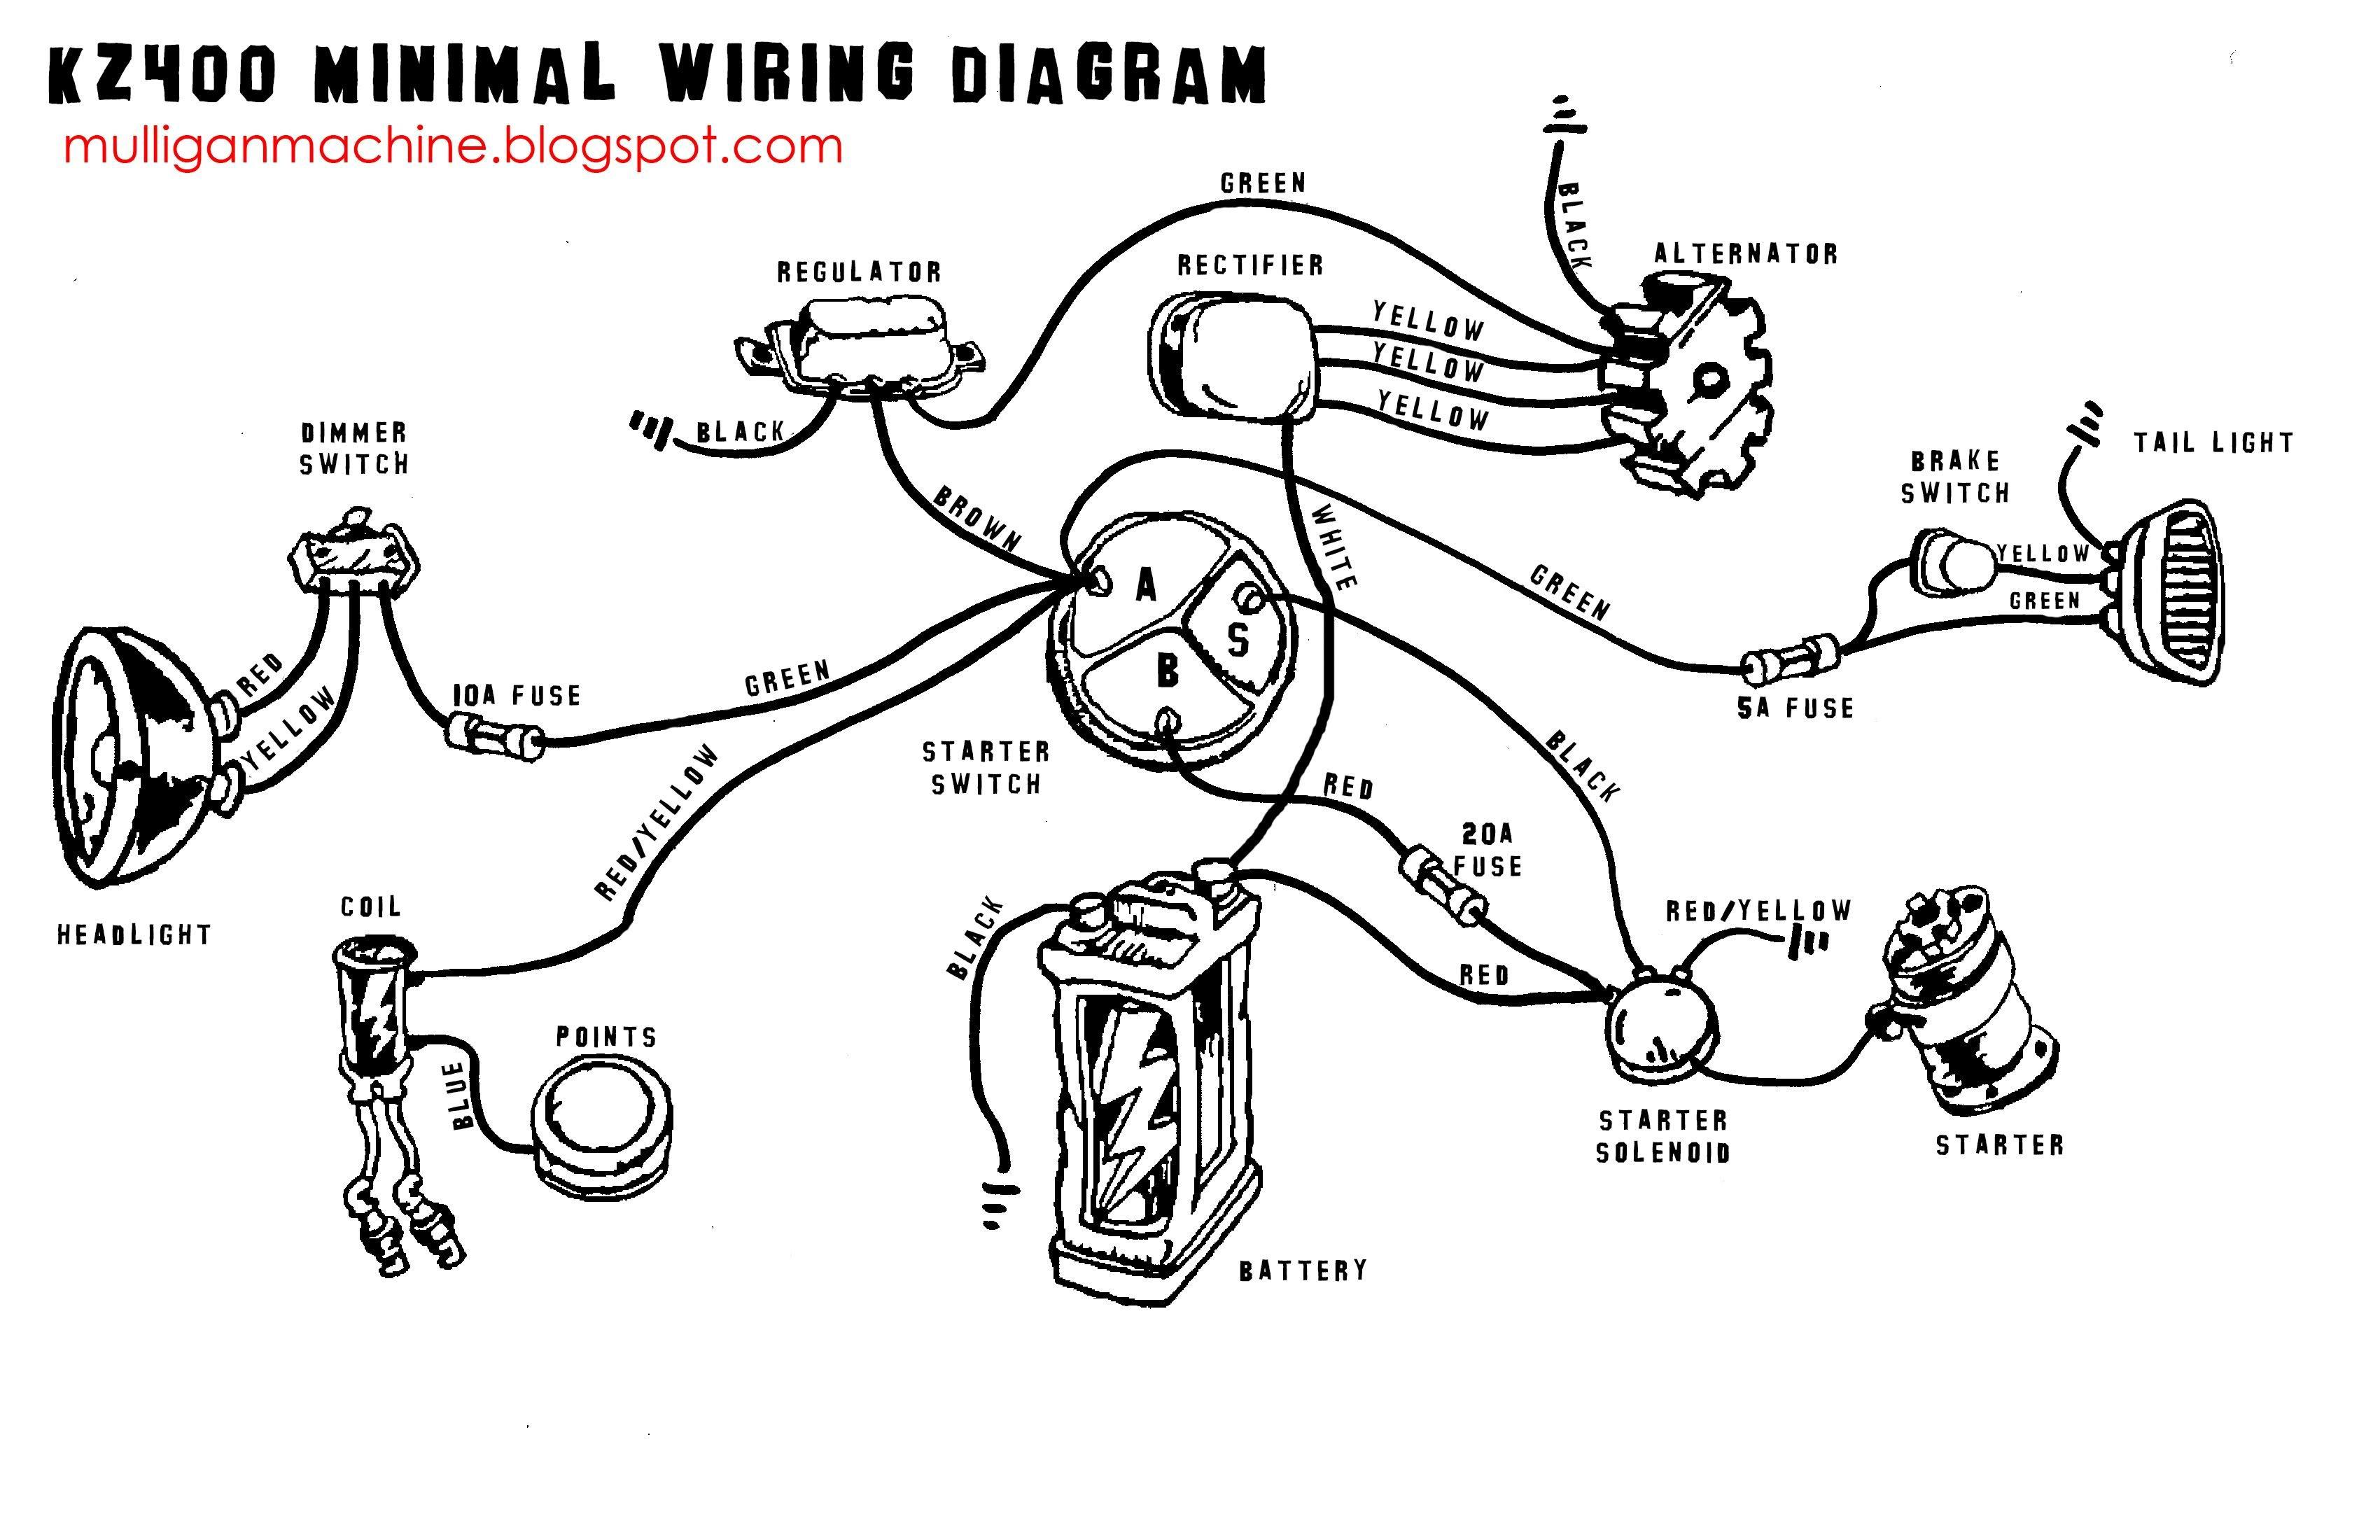 2006 Suzuki Grand Vitara Fuse Box Location Wiring Diagram And 2001 Engine 6c762 Xl7 Every Find 2003 In Addition Starter On